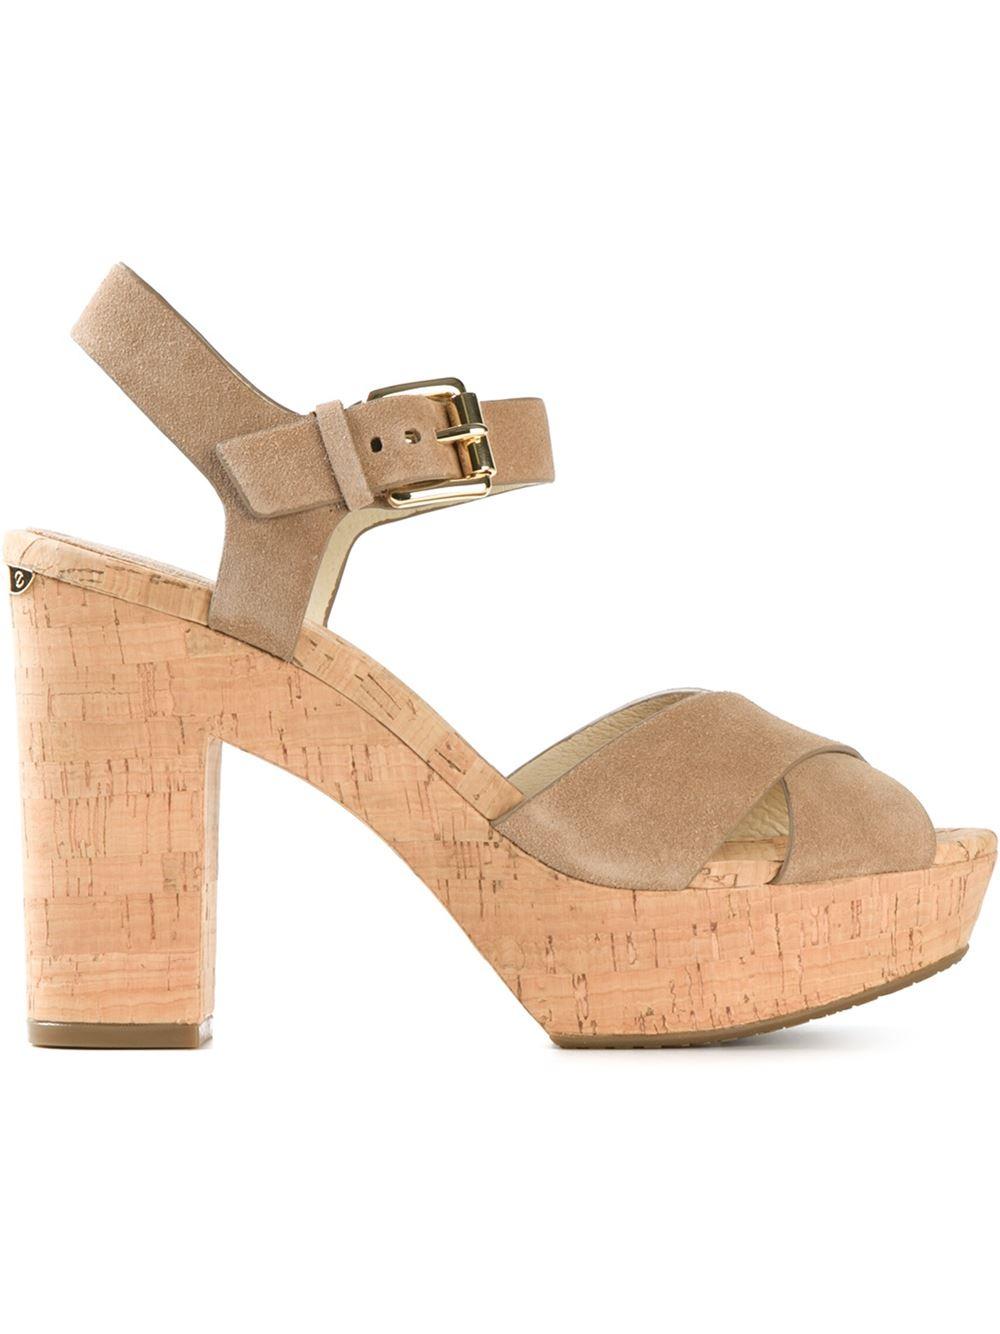 356e0cd209dd Lyst - MICHAEL Michael Kors Natalia Suede Platform Sandals in Brown